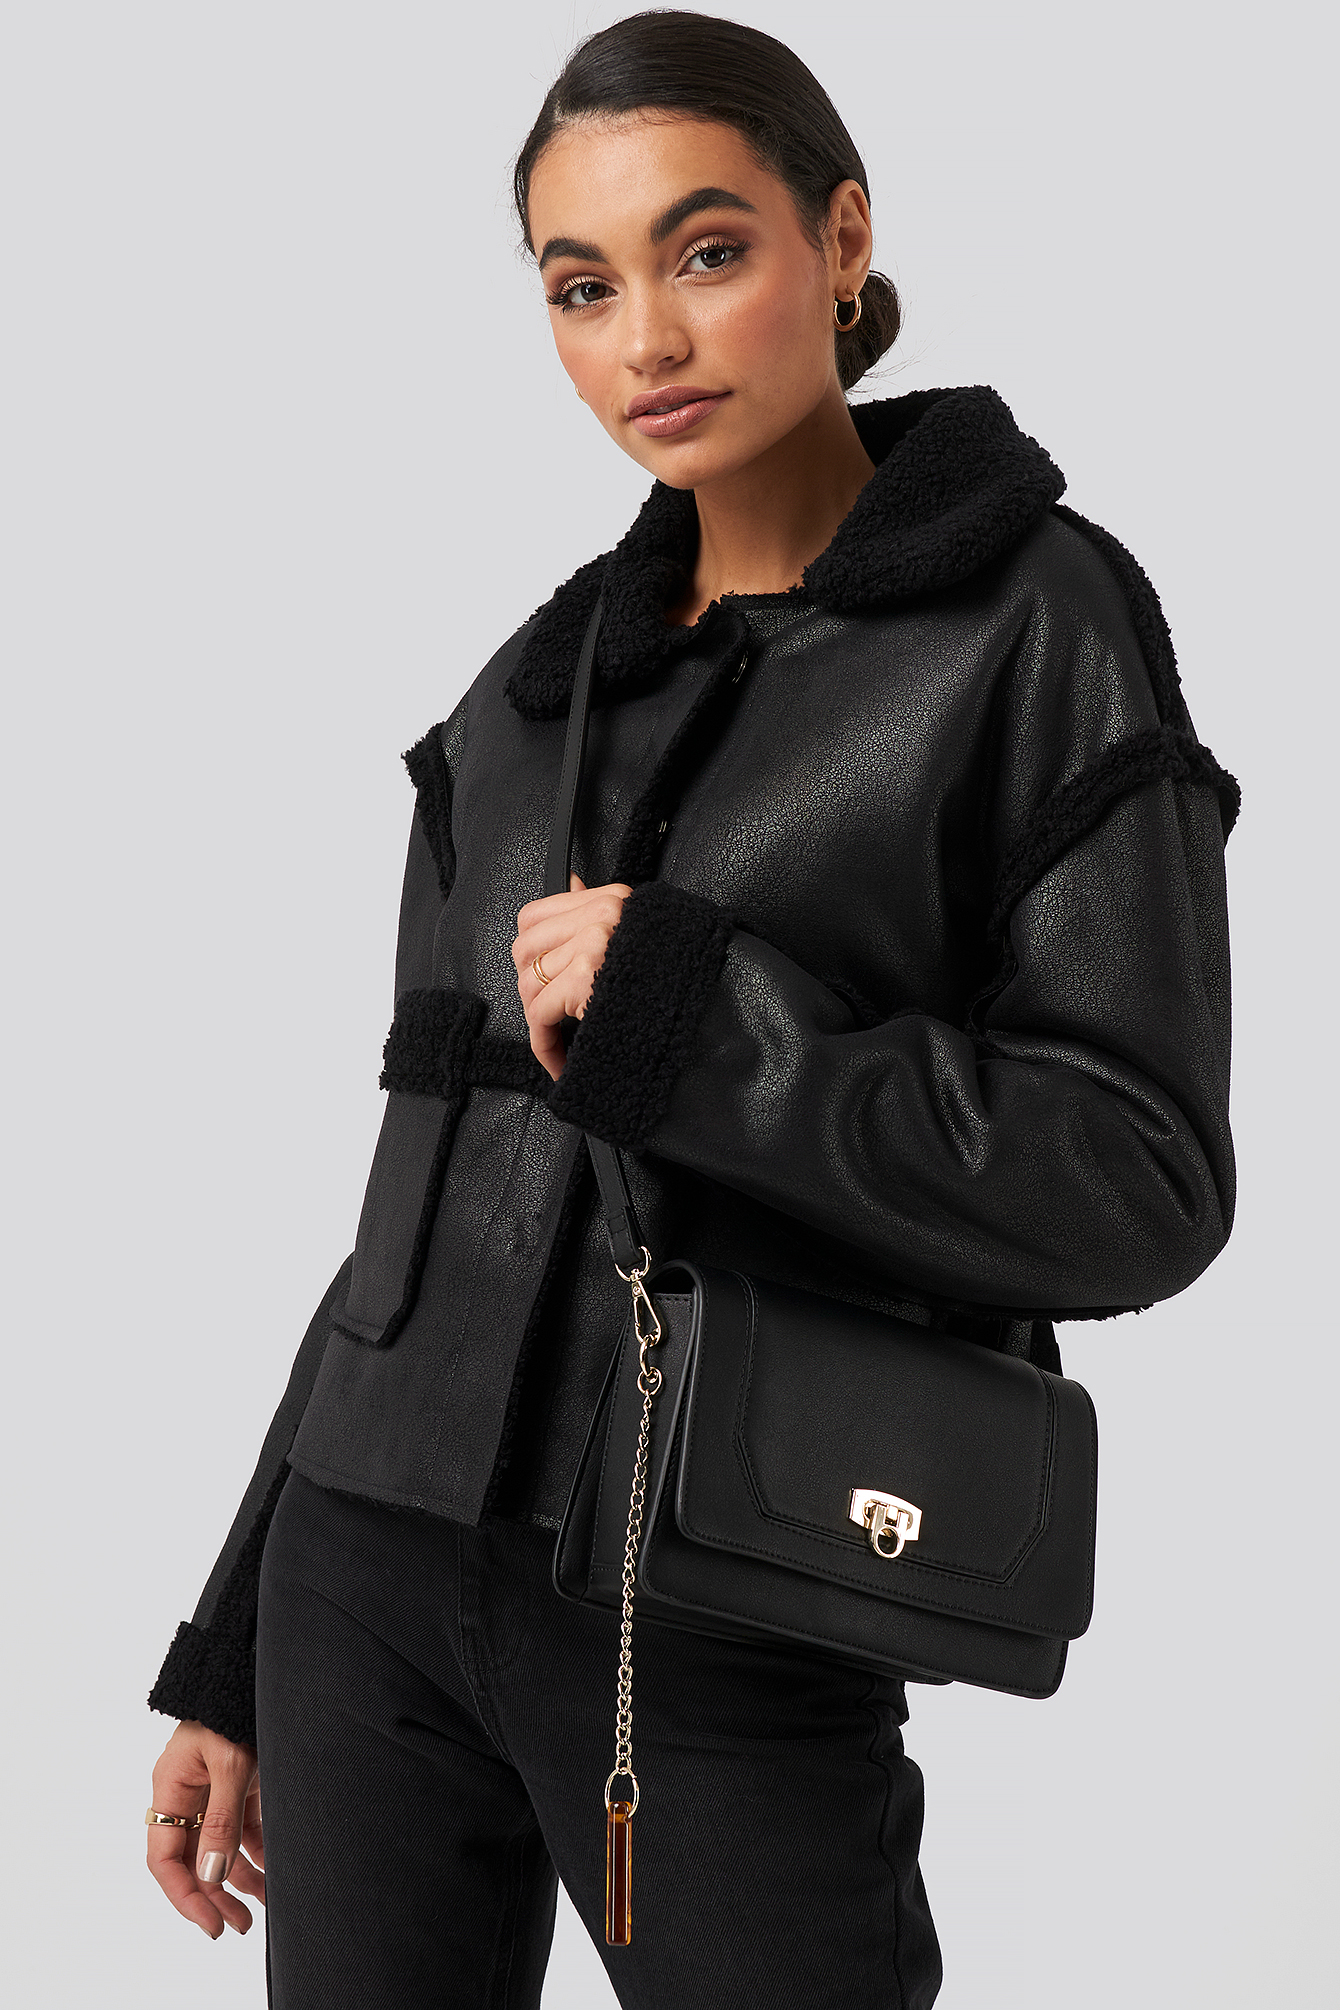 na-kd accessories -  Triangle Loop Crossbody Bag - Black